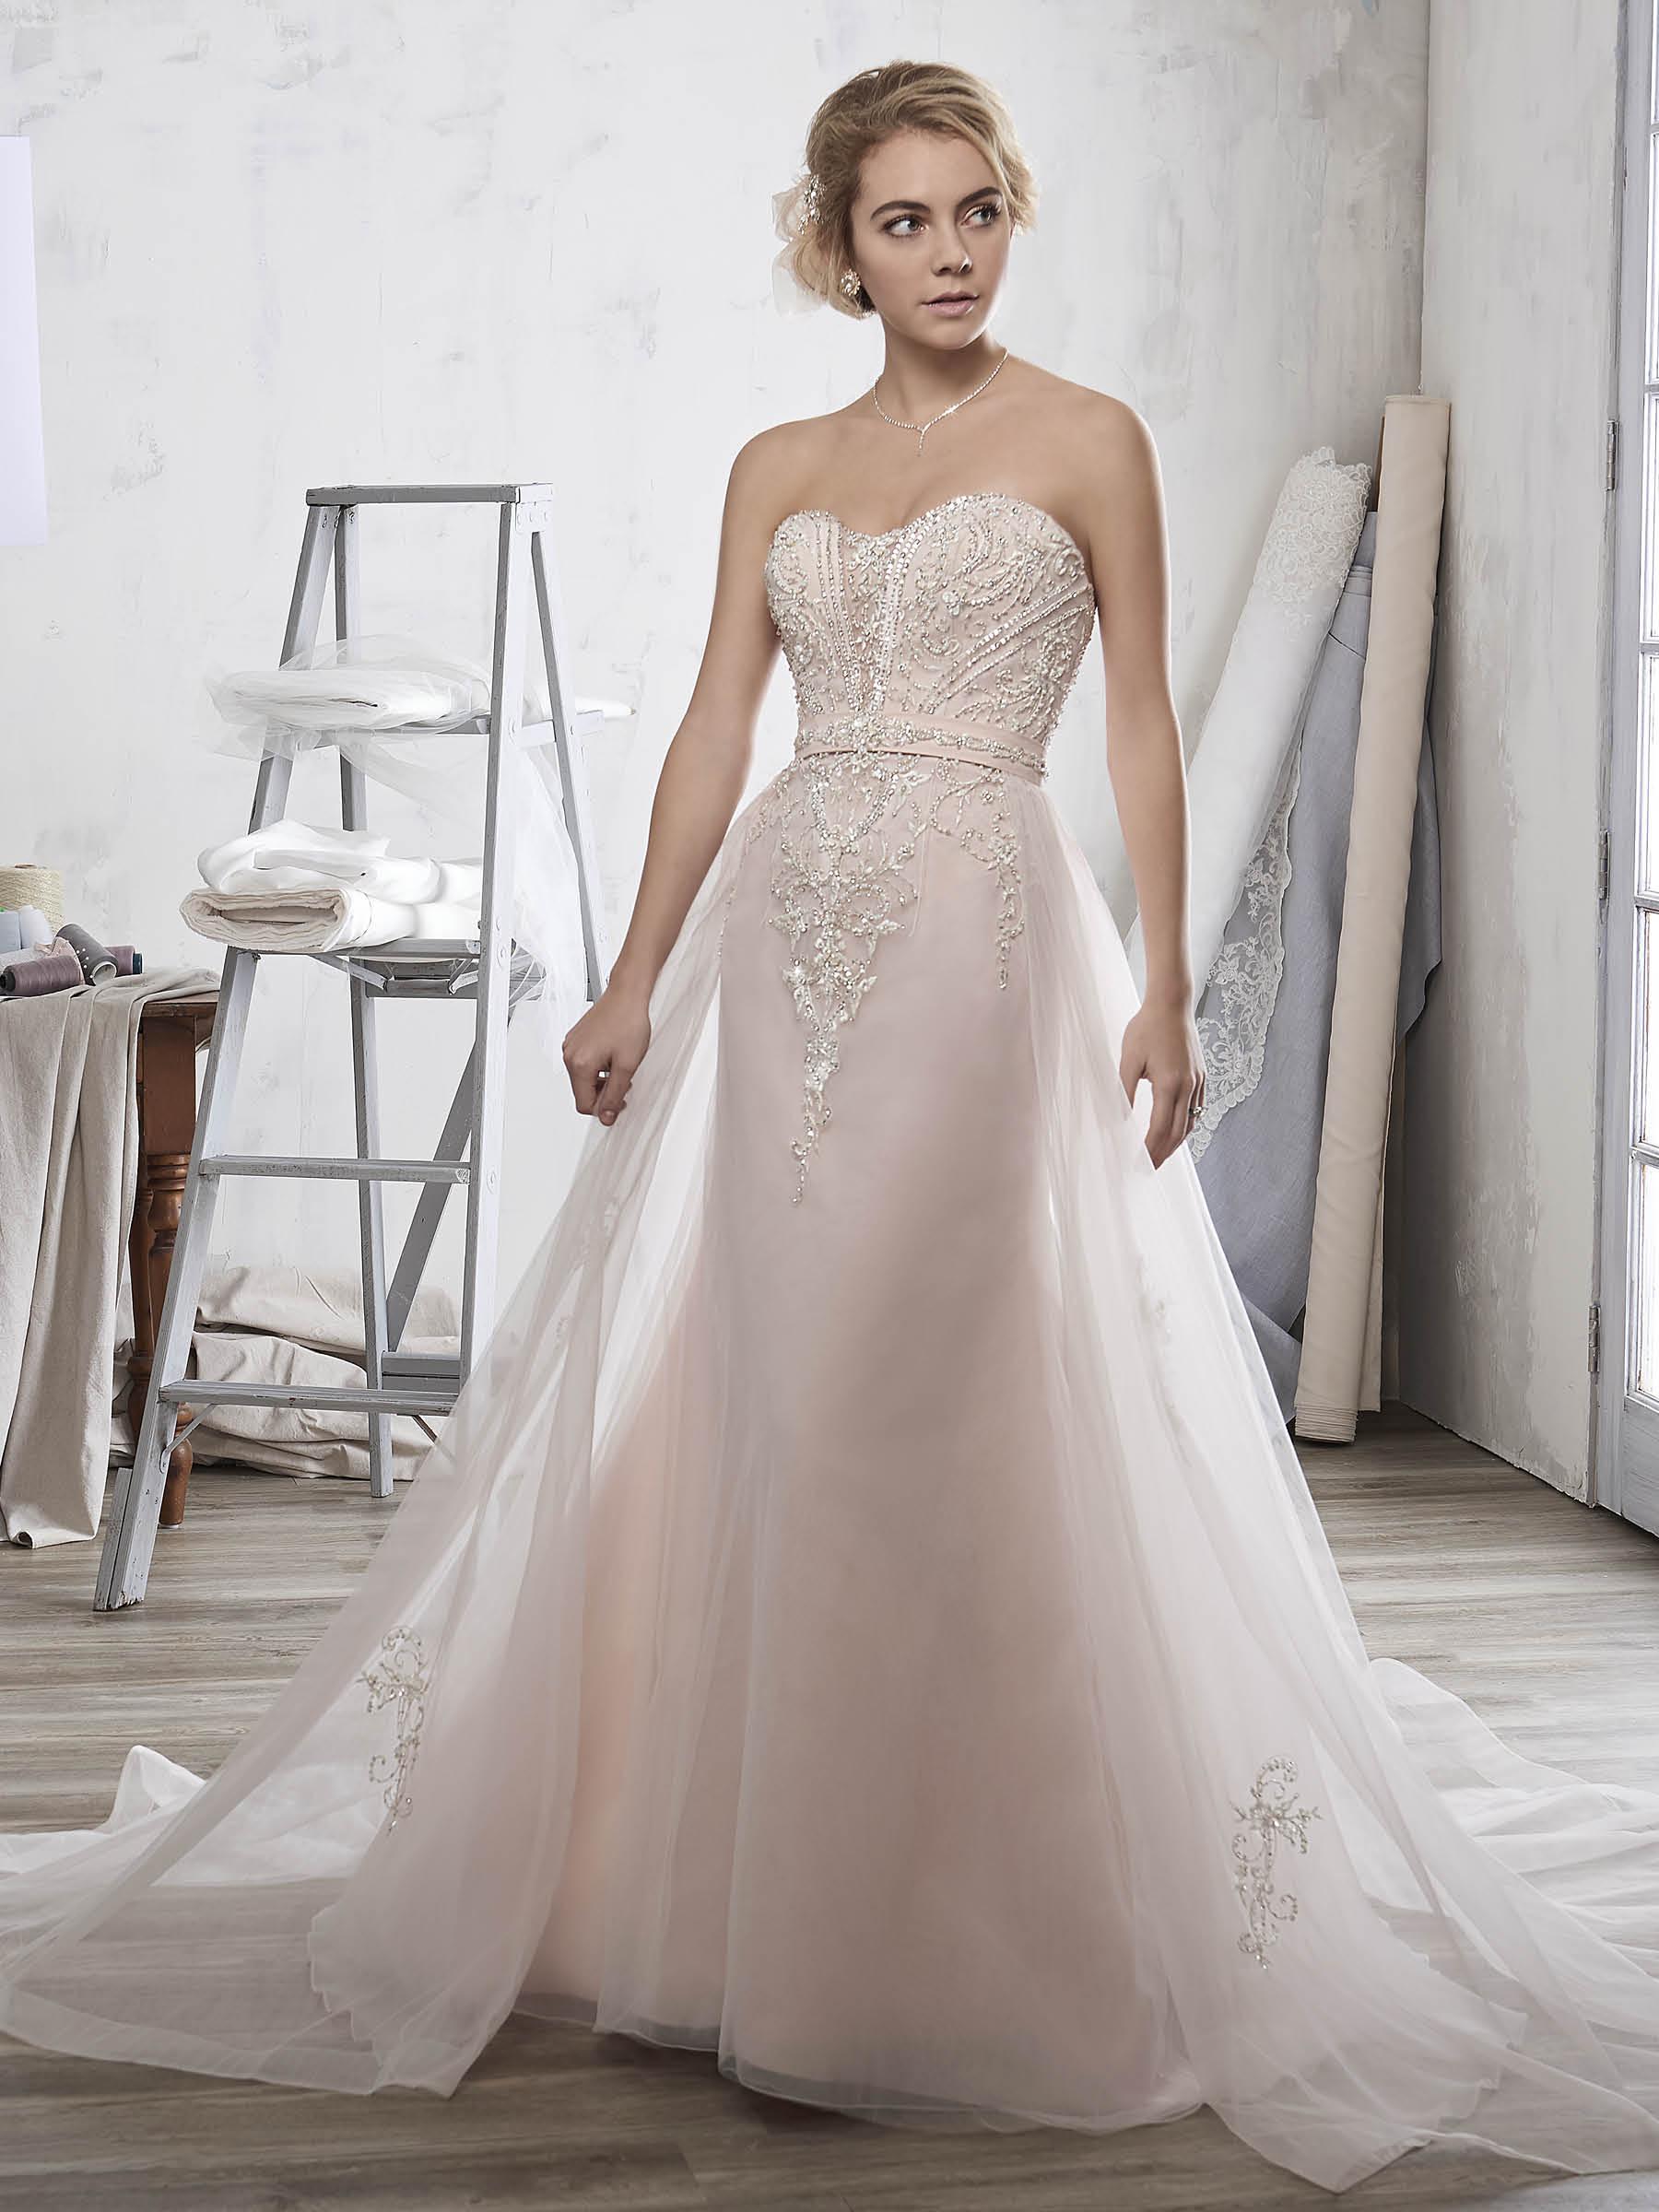 7acc354fd9e0 Couture Damour Bridal Dresses